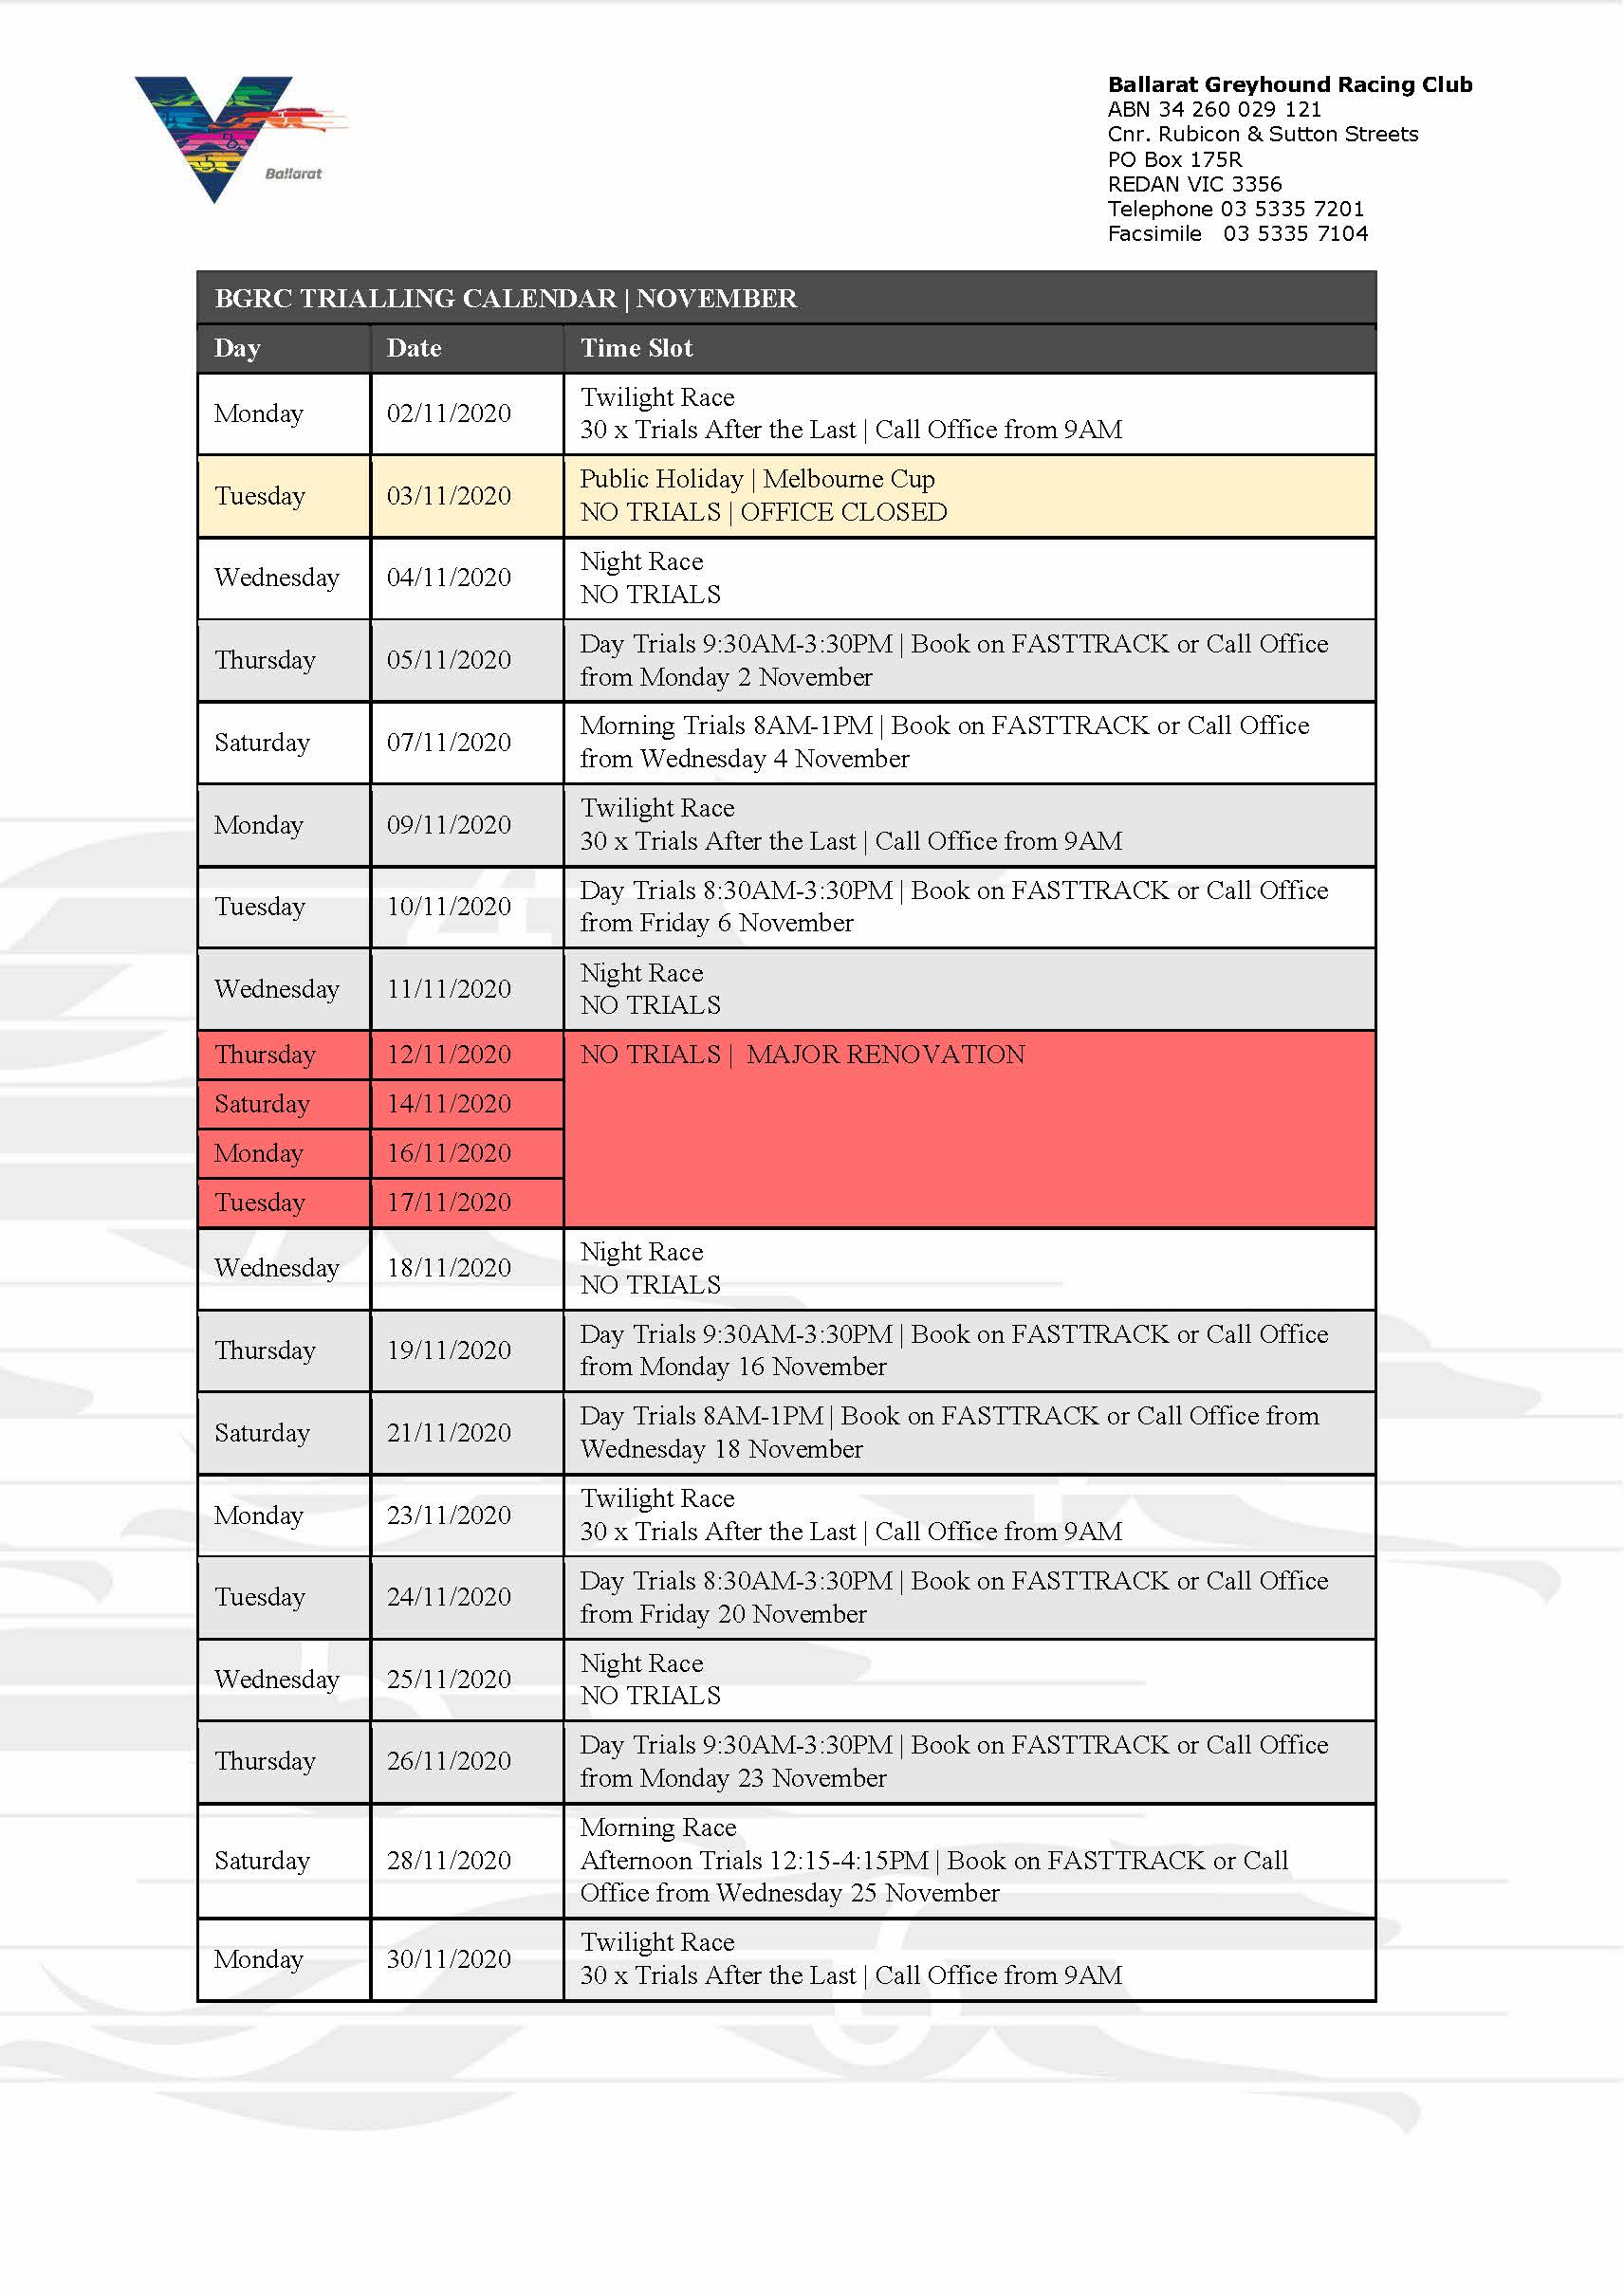 NOV TRIAL CAL_MAJOR RENOVATION NOTIFICATION